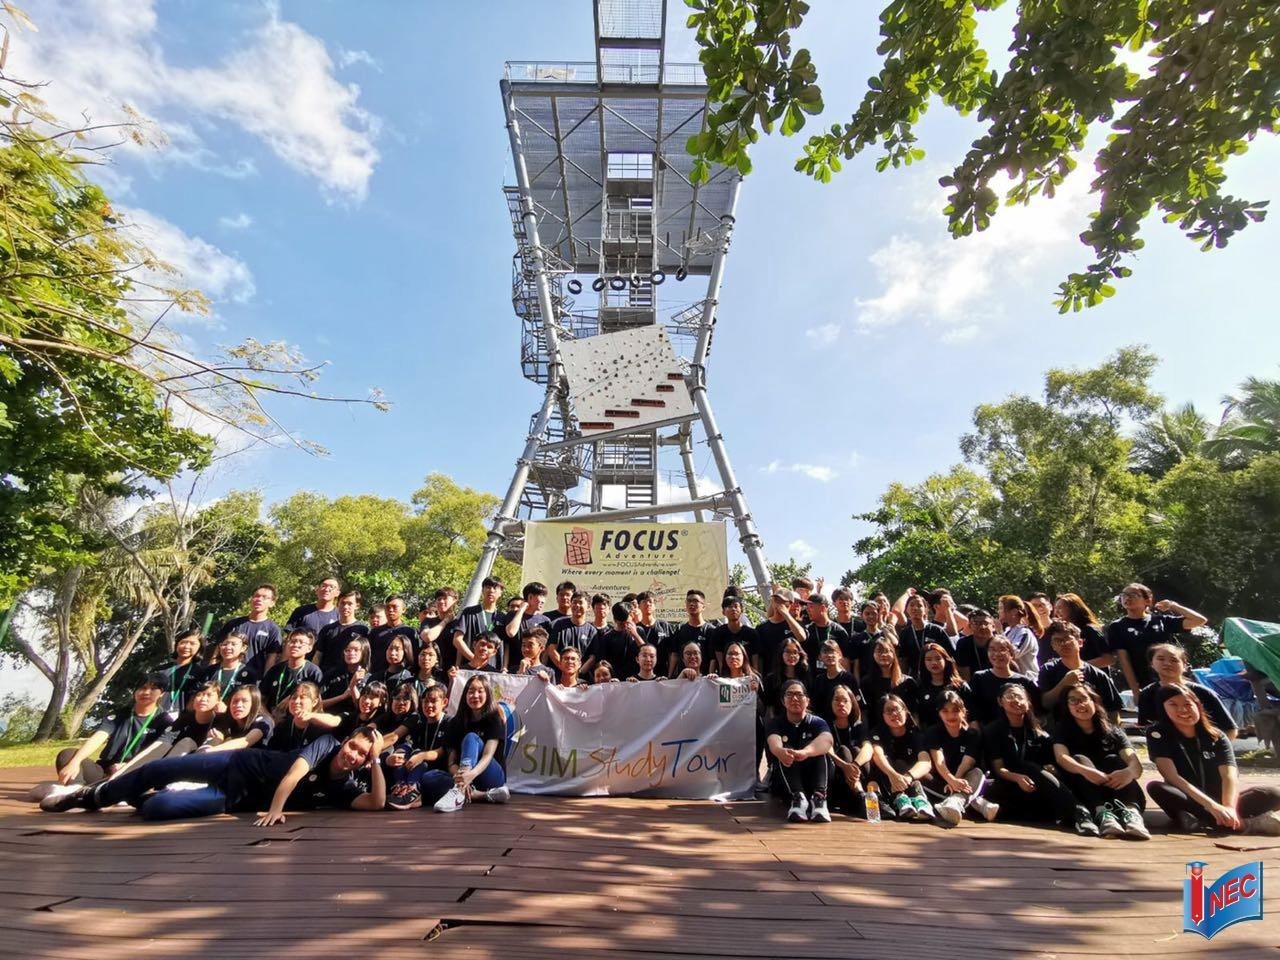 Du học hè Singapore SIM study Tour 2019